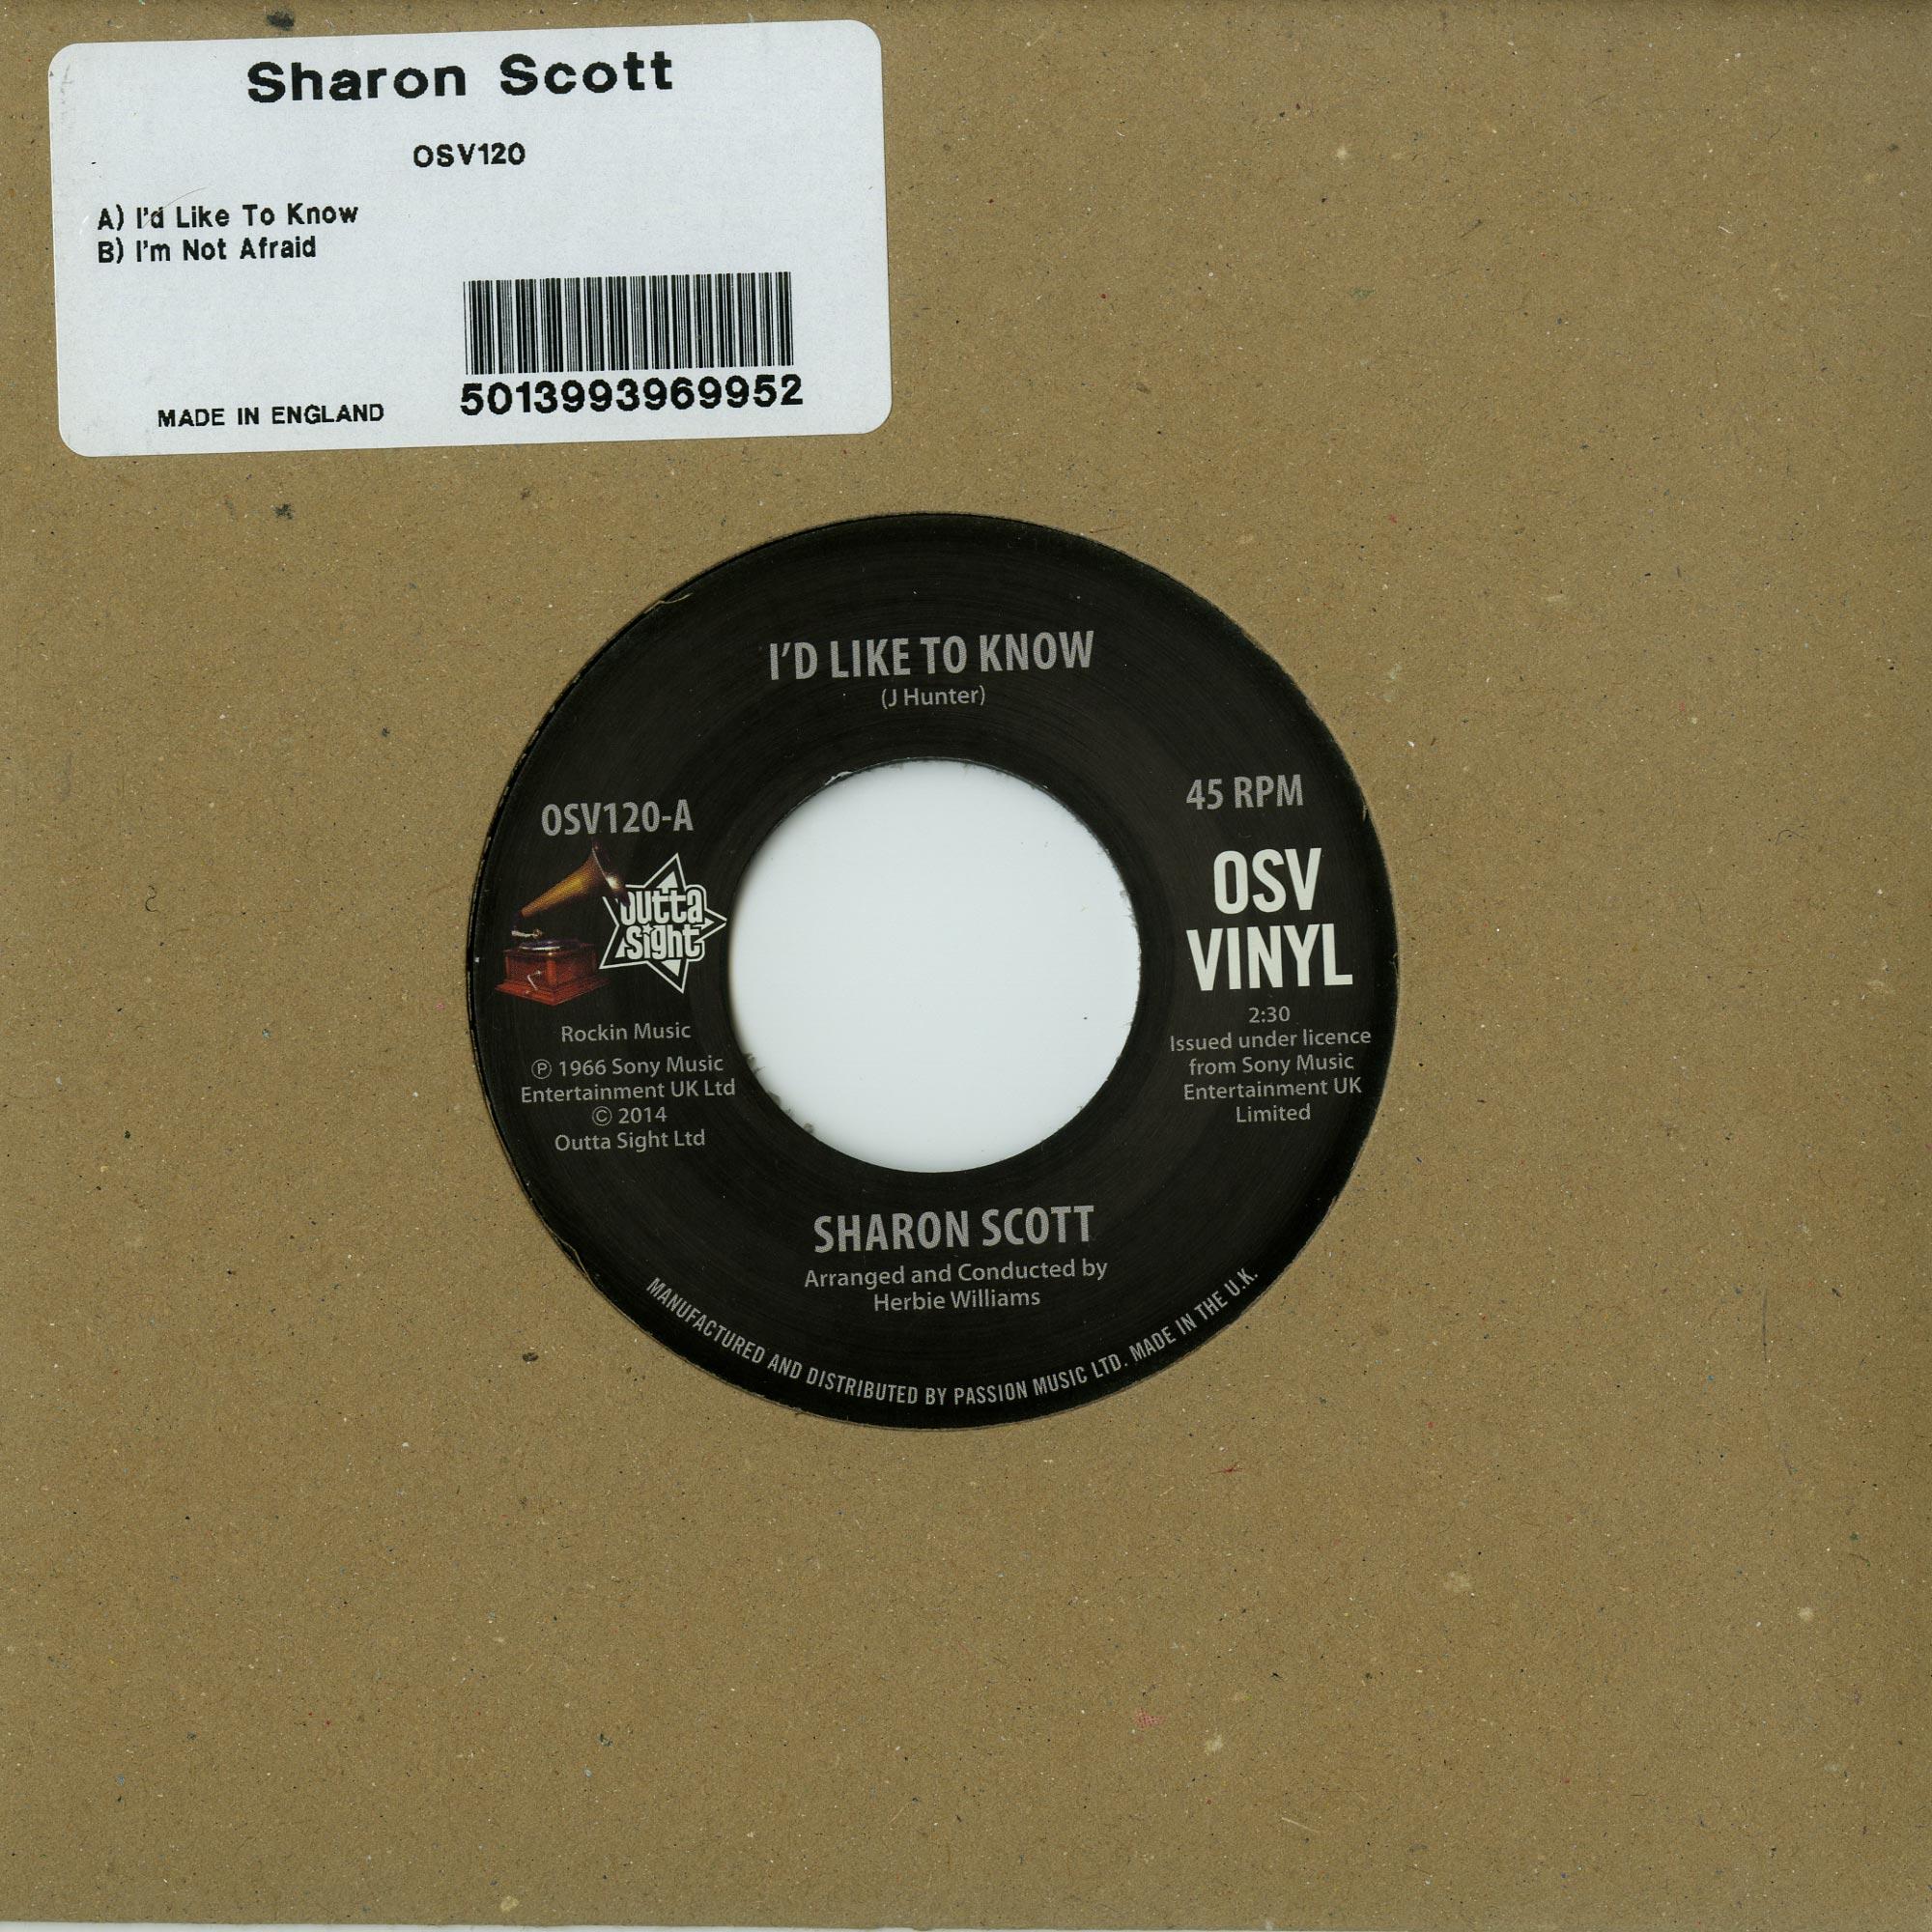 Sharon Scott - ID LIKE T O KNOW/IM NOT